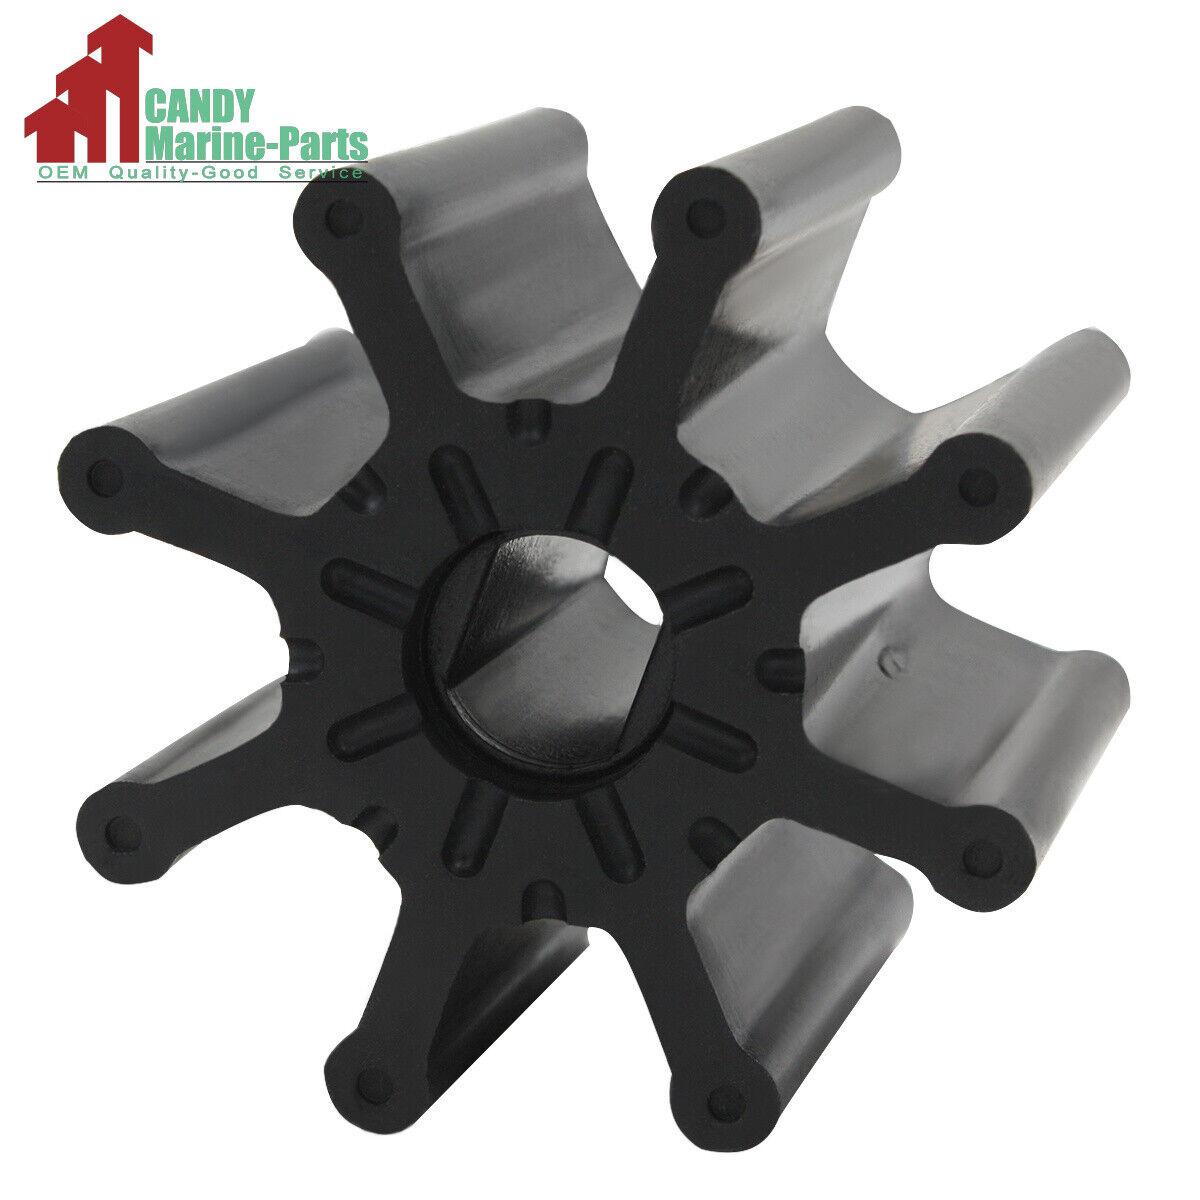 Mercury Quicksilver Parts 862232A 2 IMPELLER KIT QUICKSILVER IMPELLERS